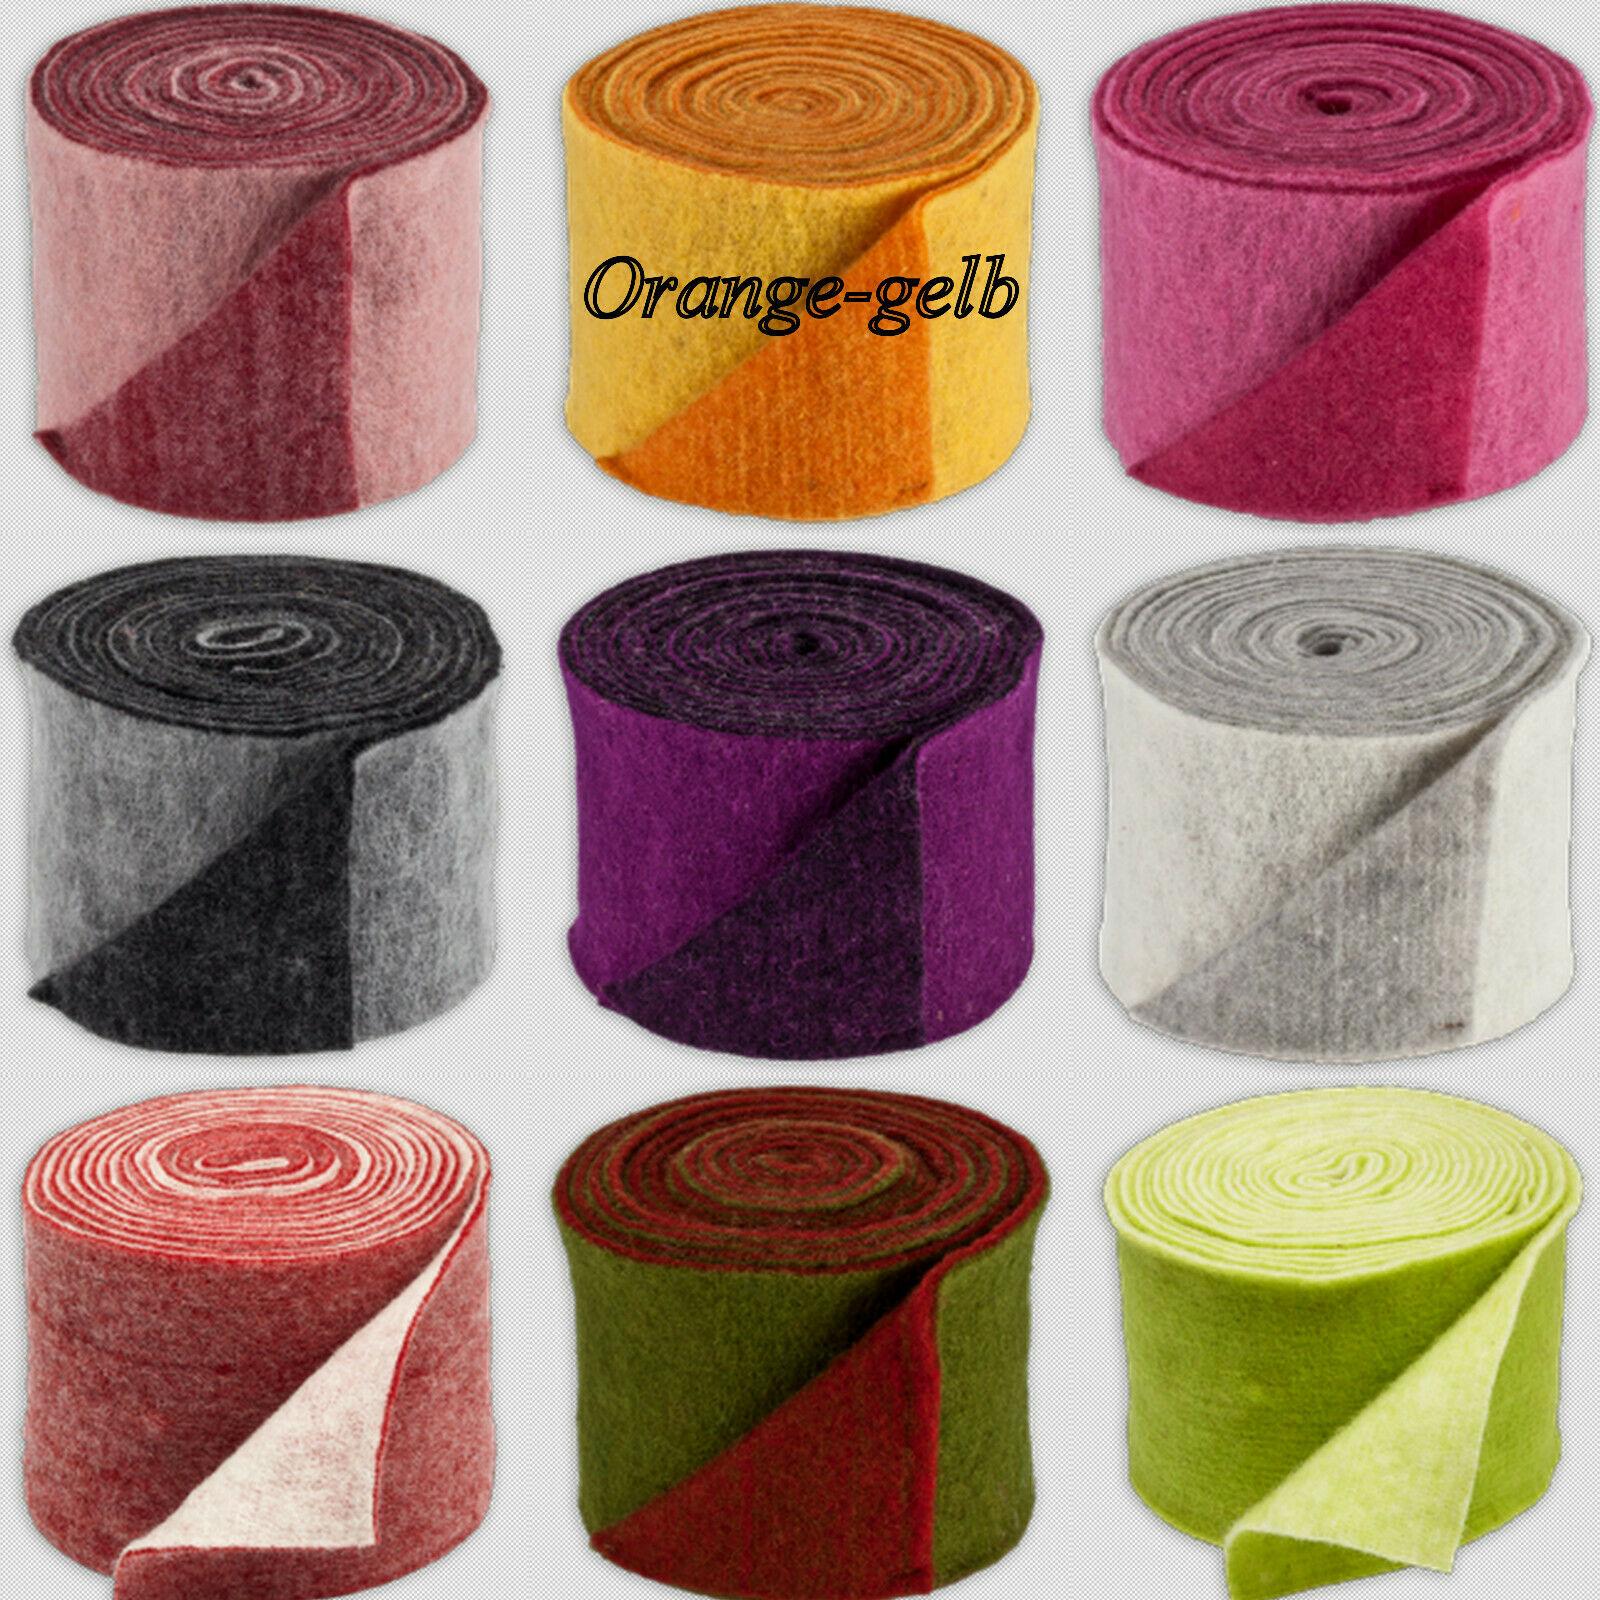 Topfband Filz 5 m x 15 cm zwei-farbige Dekoband Wollvlies Filz-Band Wollband  - Orange-gelb